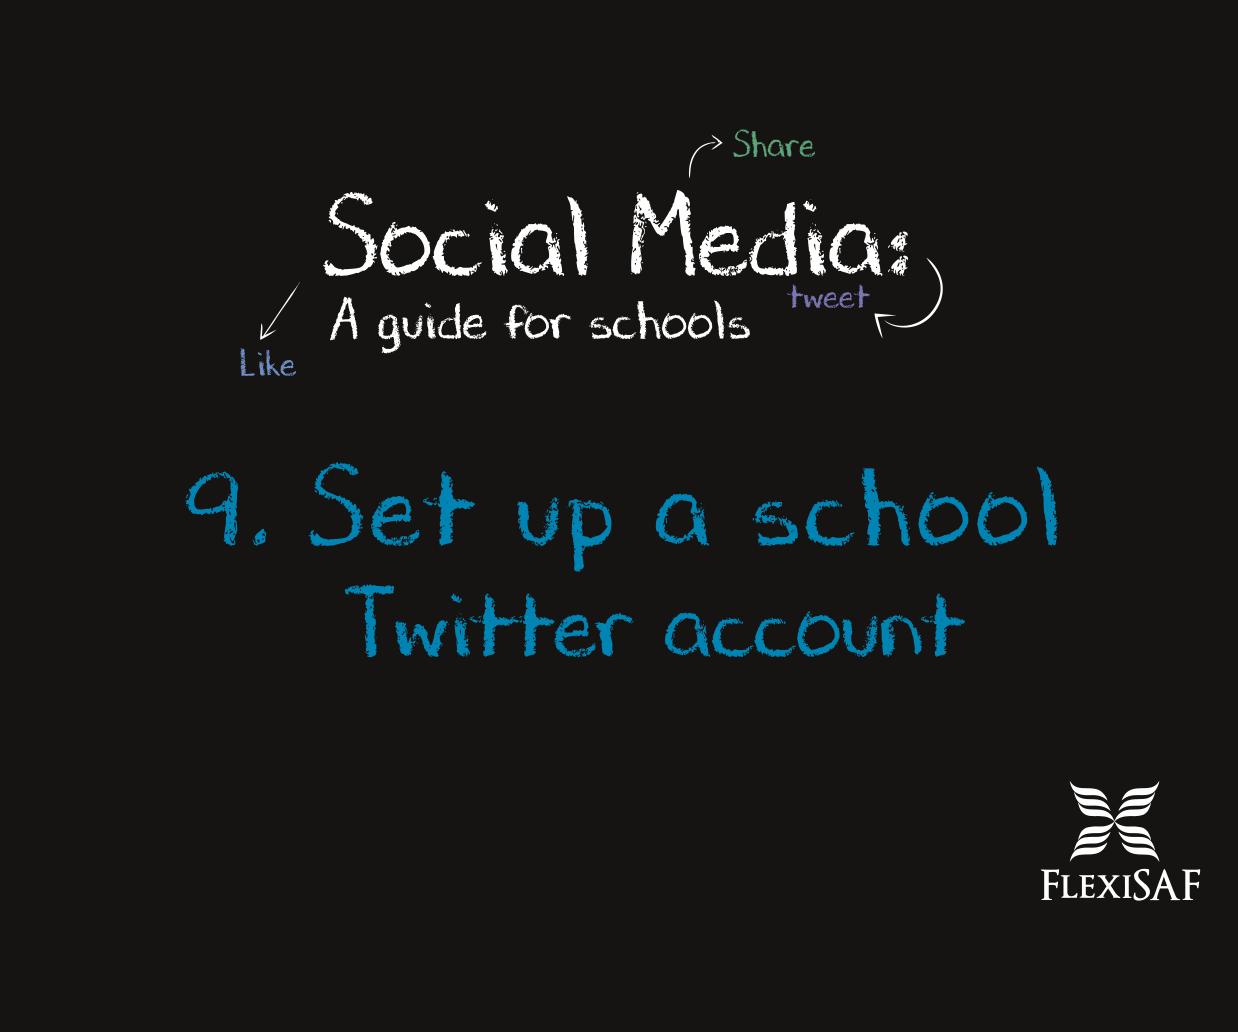 9. Set up a School Twitter Account